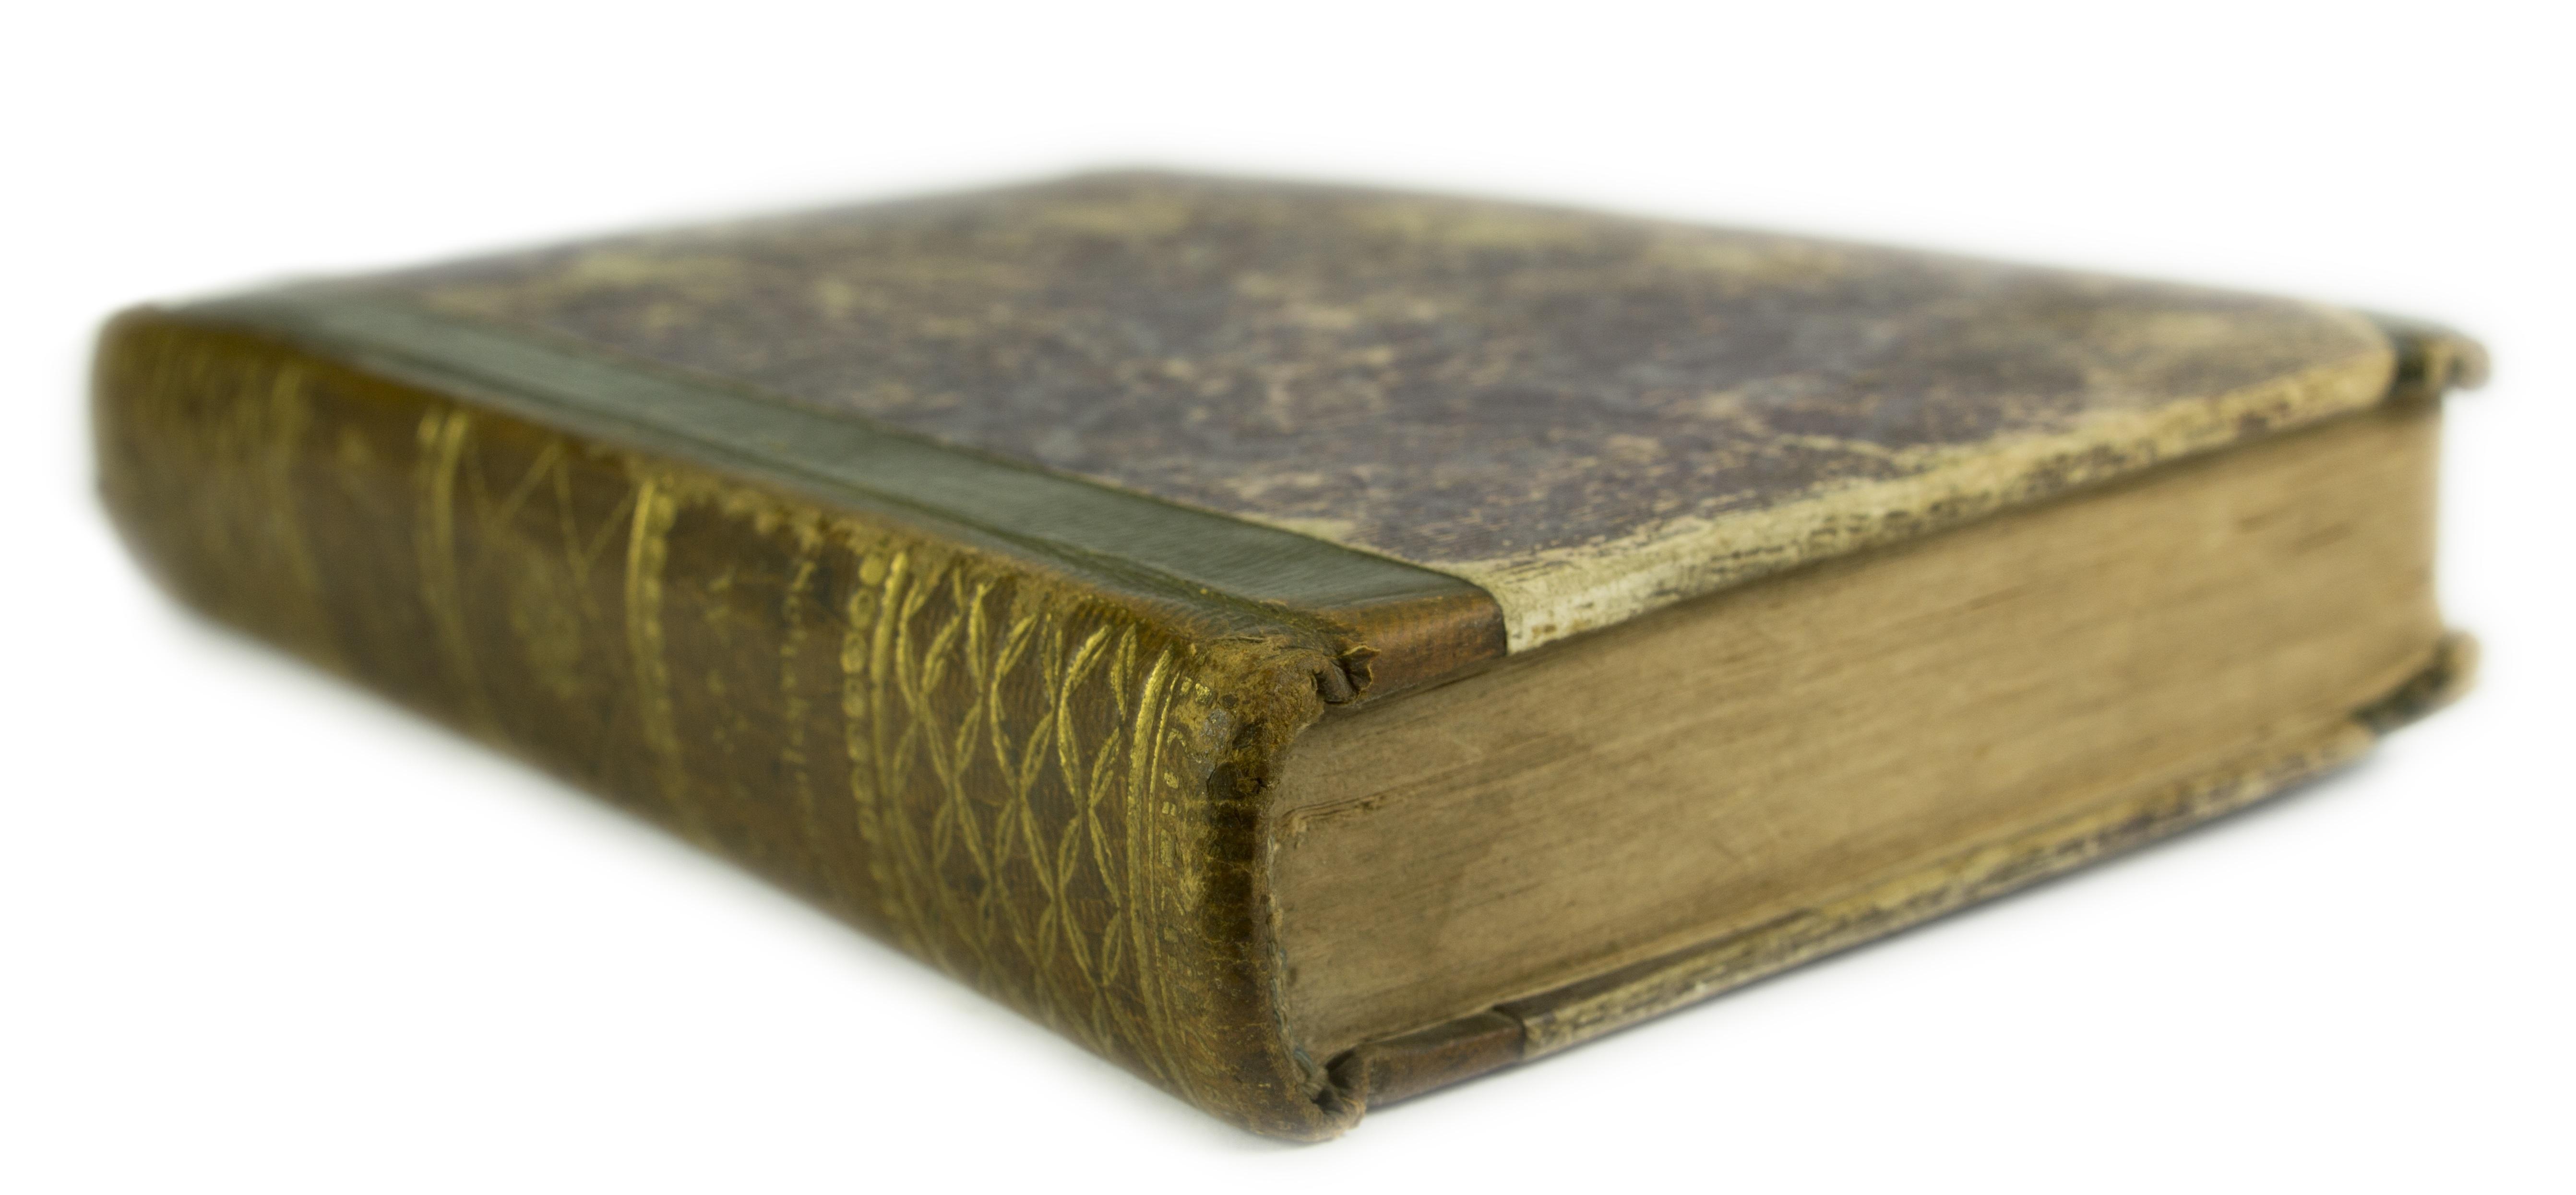 Free Images : book, wood, leather, vintage, antique, retro ...